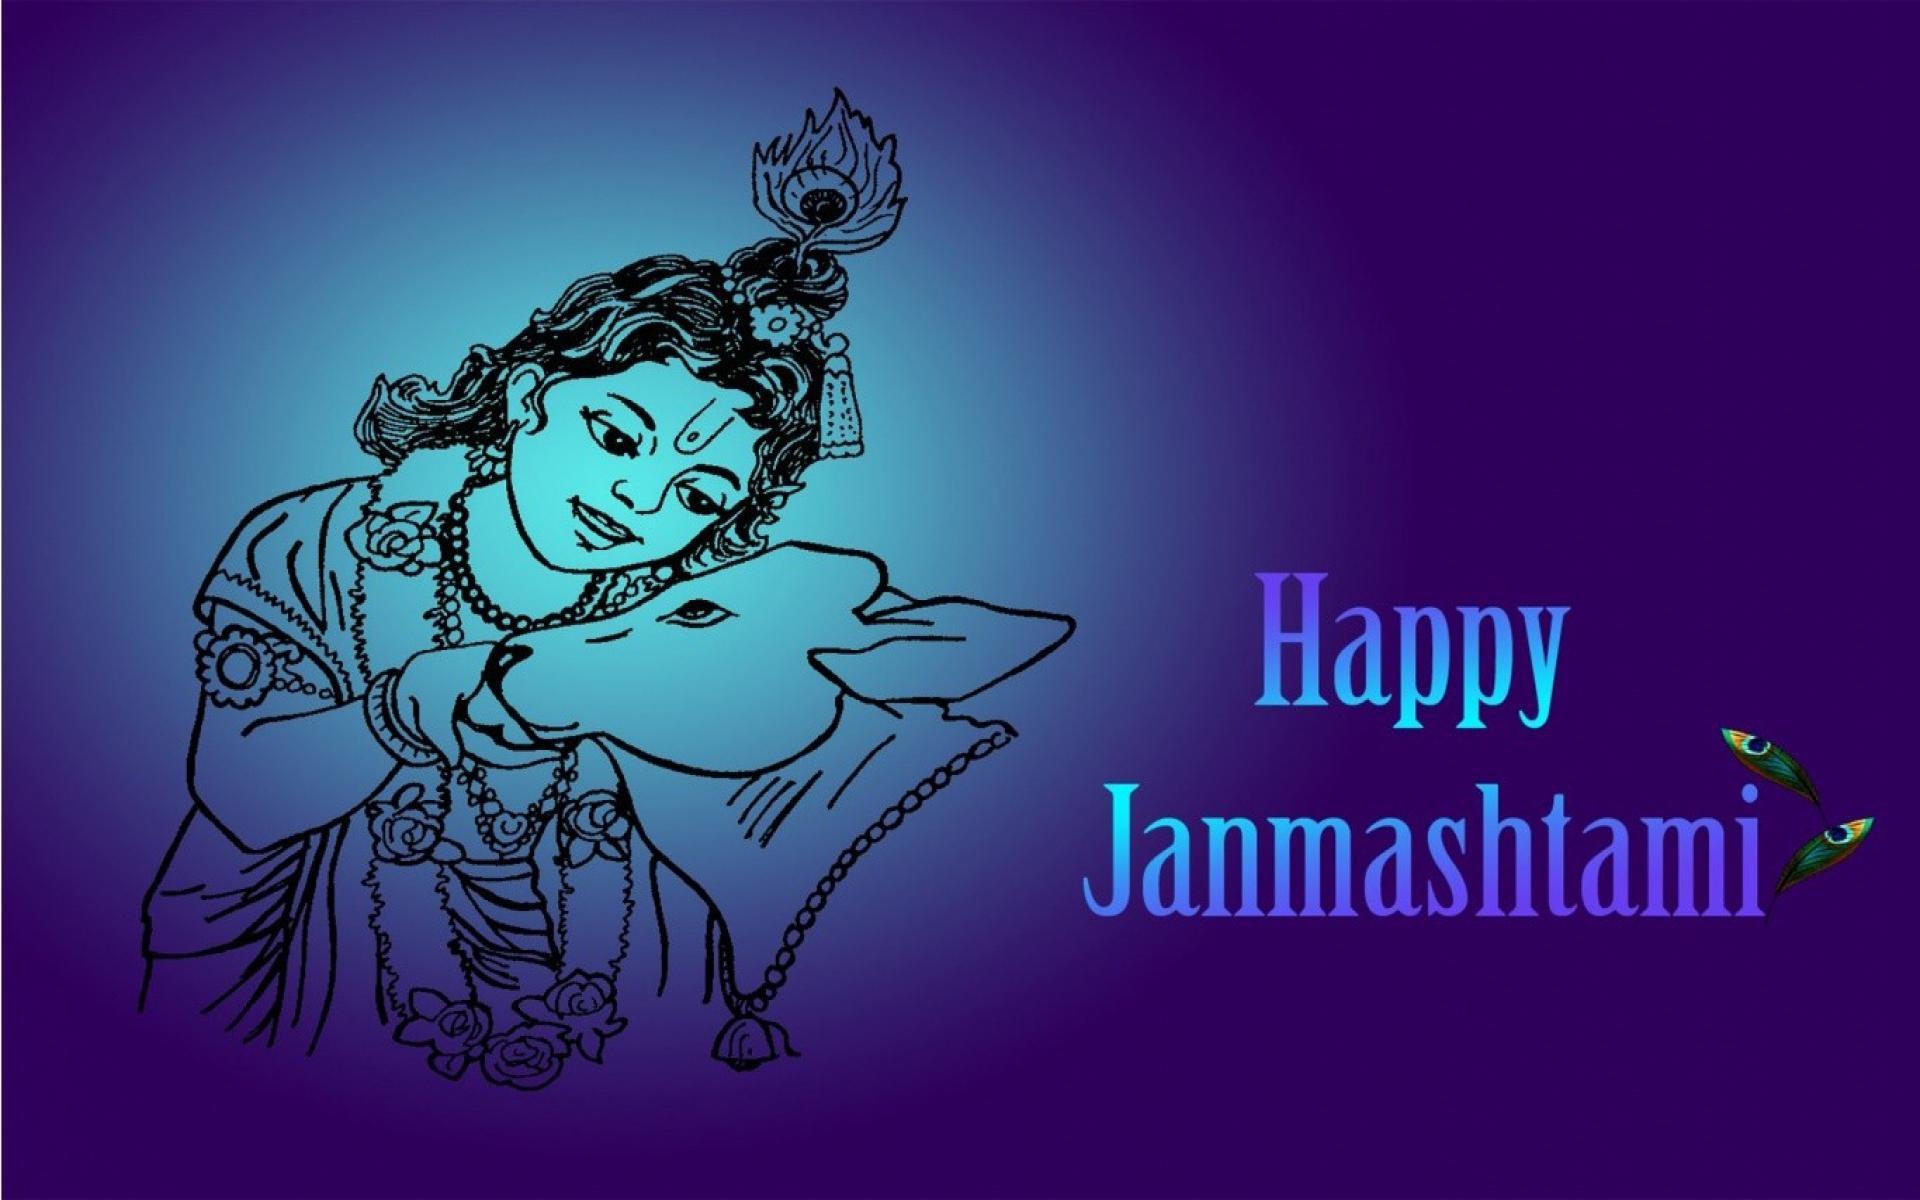 Shree Krishna Janmashtami 2014 Hd Wallpaper - Krishna Janmashtami Date 2019 - HD Wallpaper